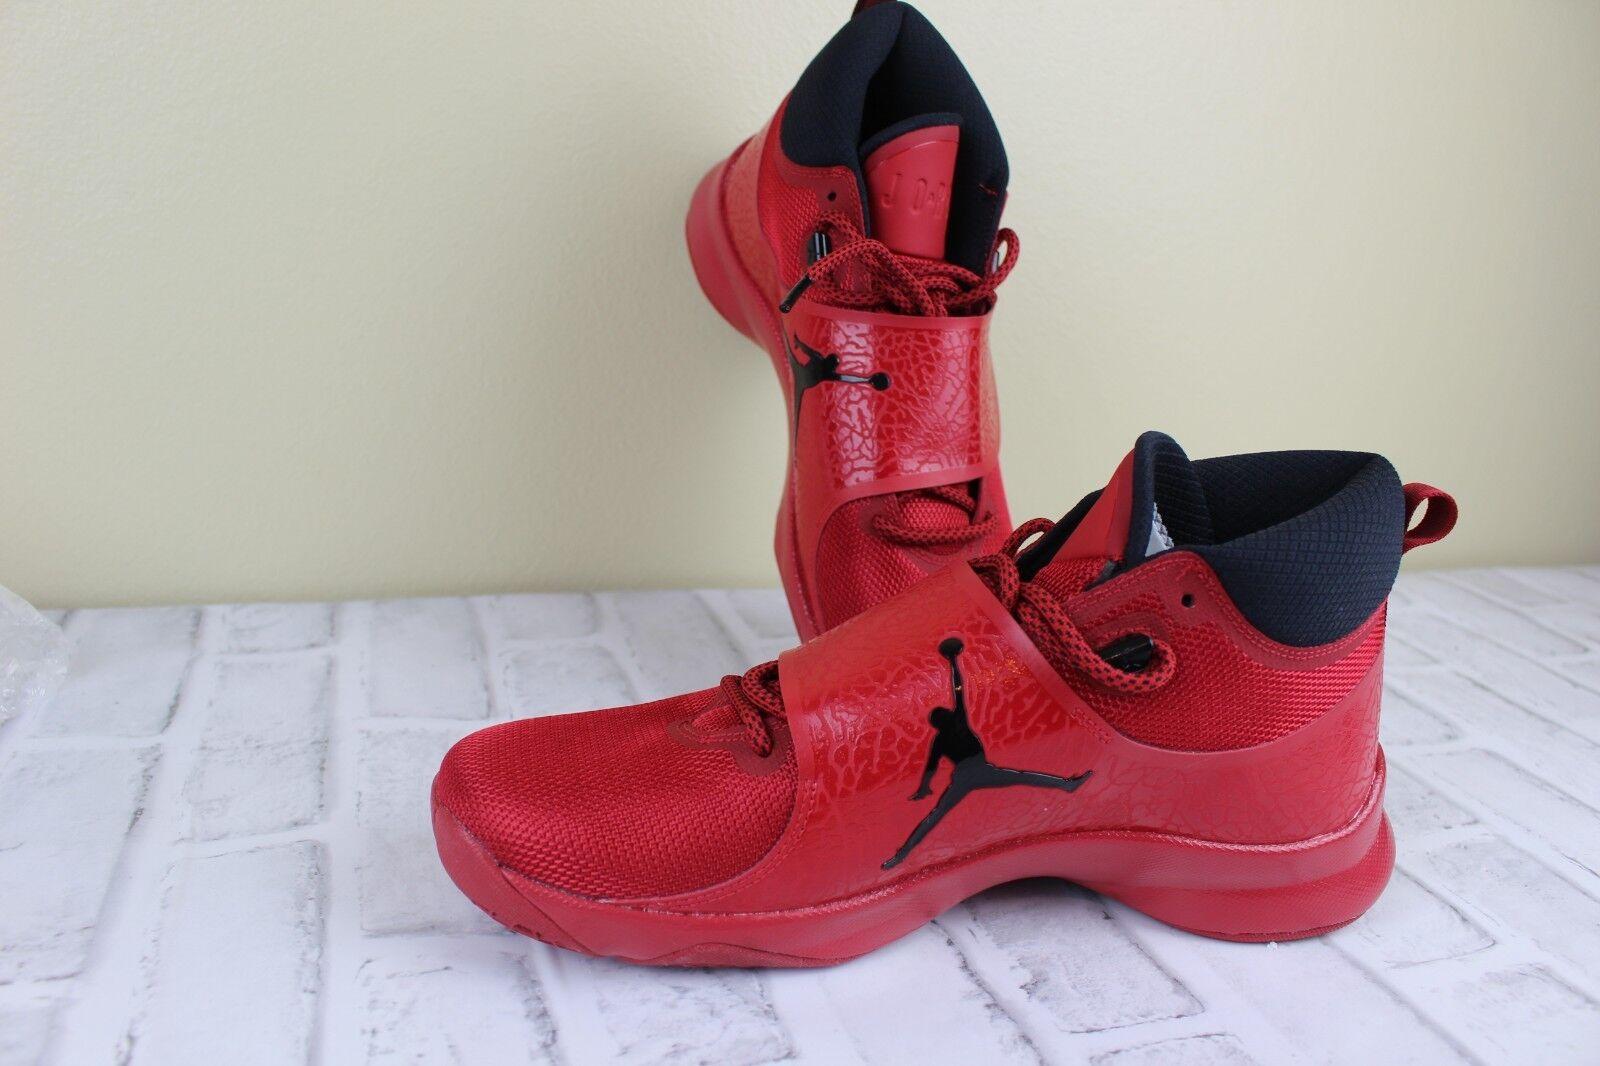 NIKE Air Jordan Men's Super Fly 5 PO Red Basketball shoes Sz 10.5 881571-601